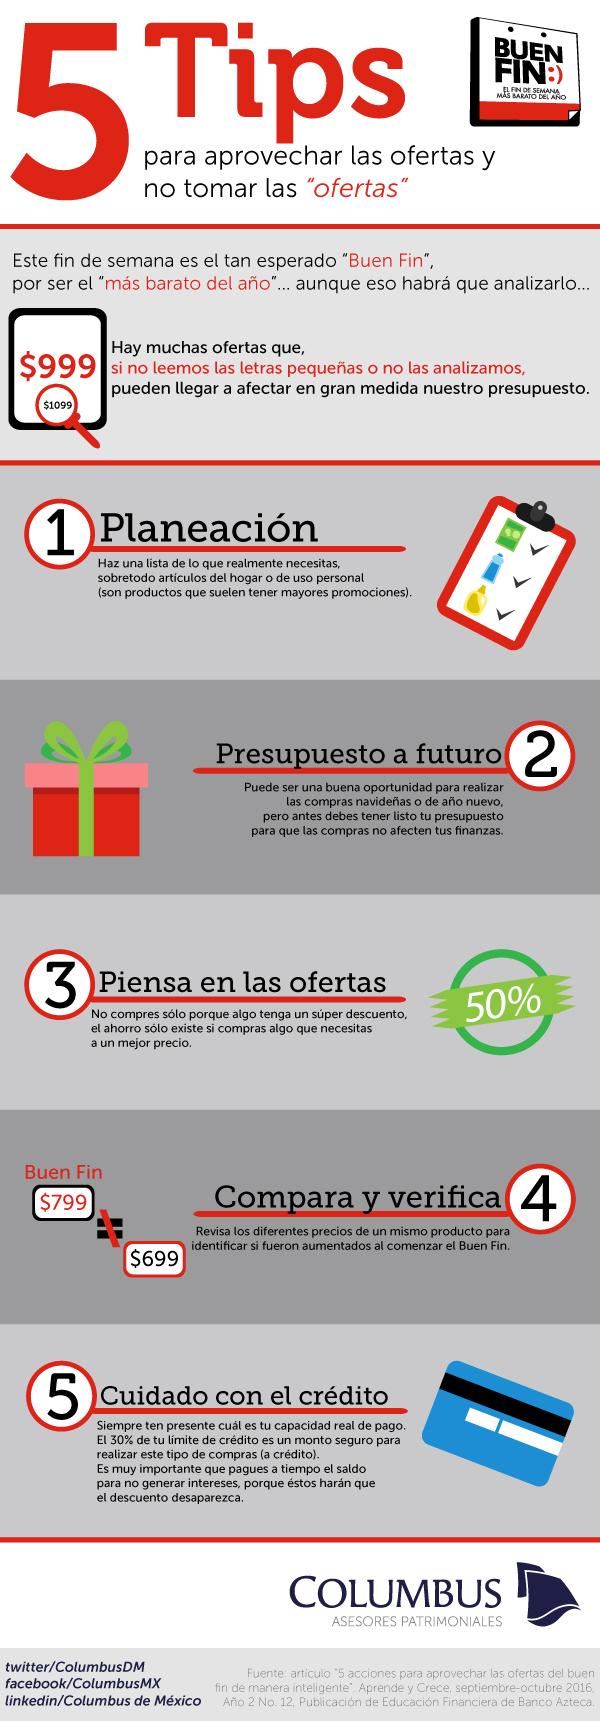 infografia-del-buen-fin